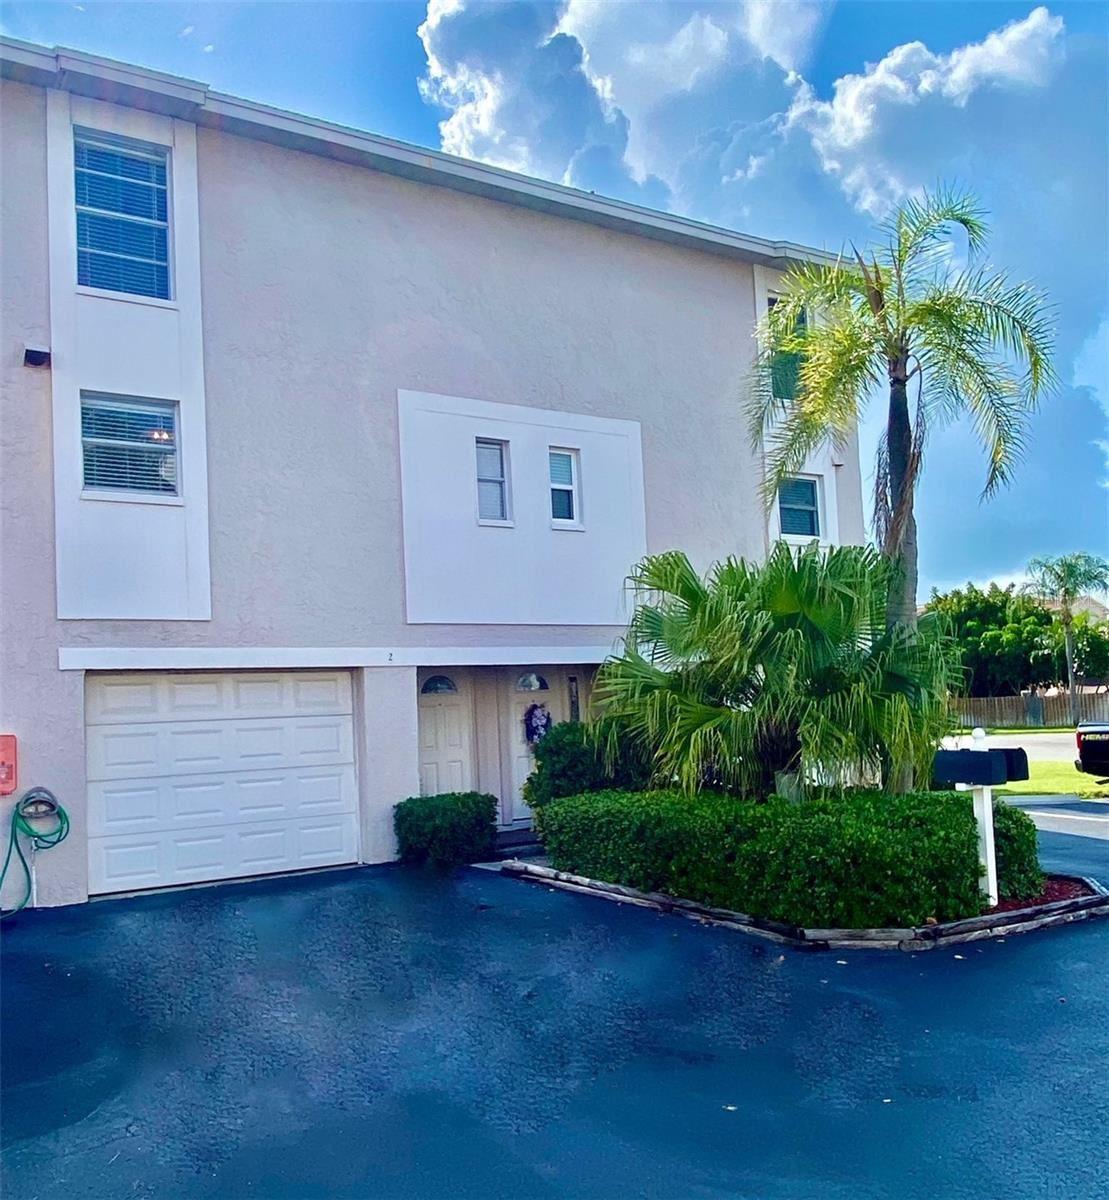 255 CAPRI CIRCLE N #2, Treasure Island, FL 33706 - MLS#: U8135762